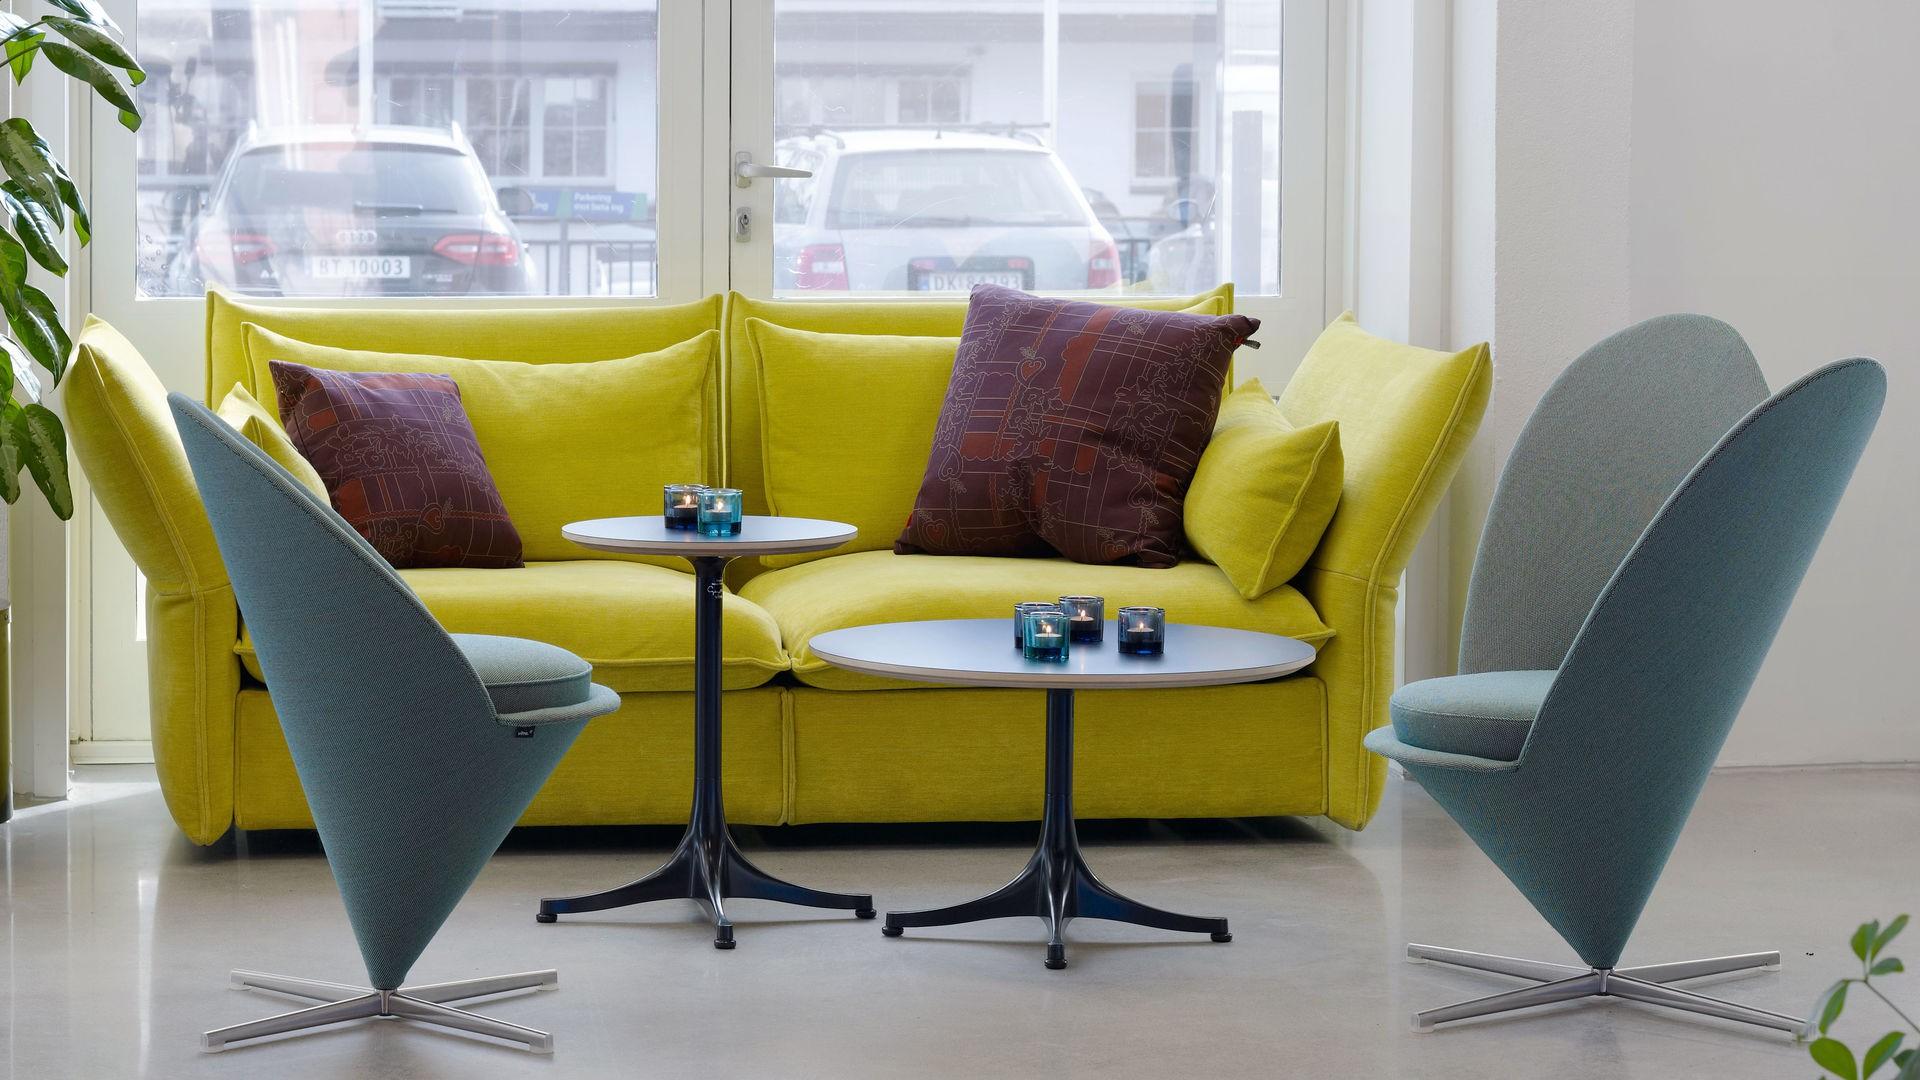 Sofa z serii Mariposa firmy Vitra. Projekt: Barber&Osgerby. Fot. Vitra